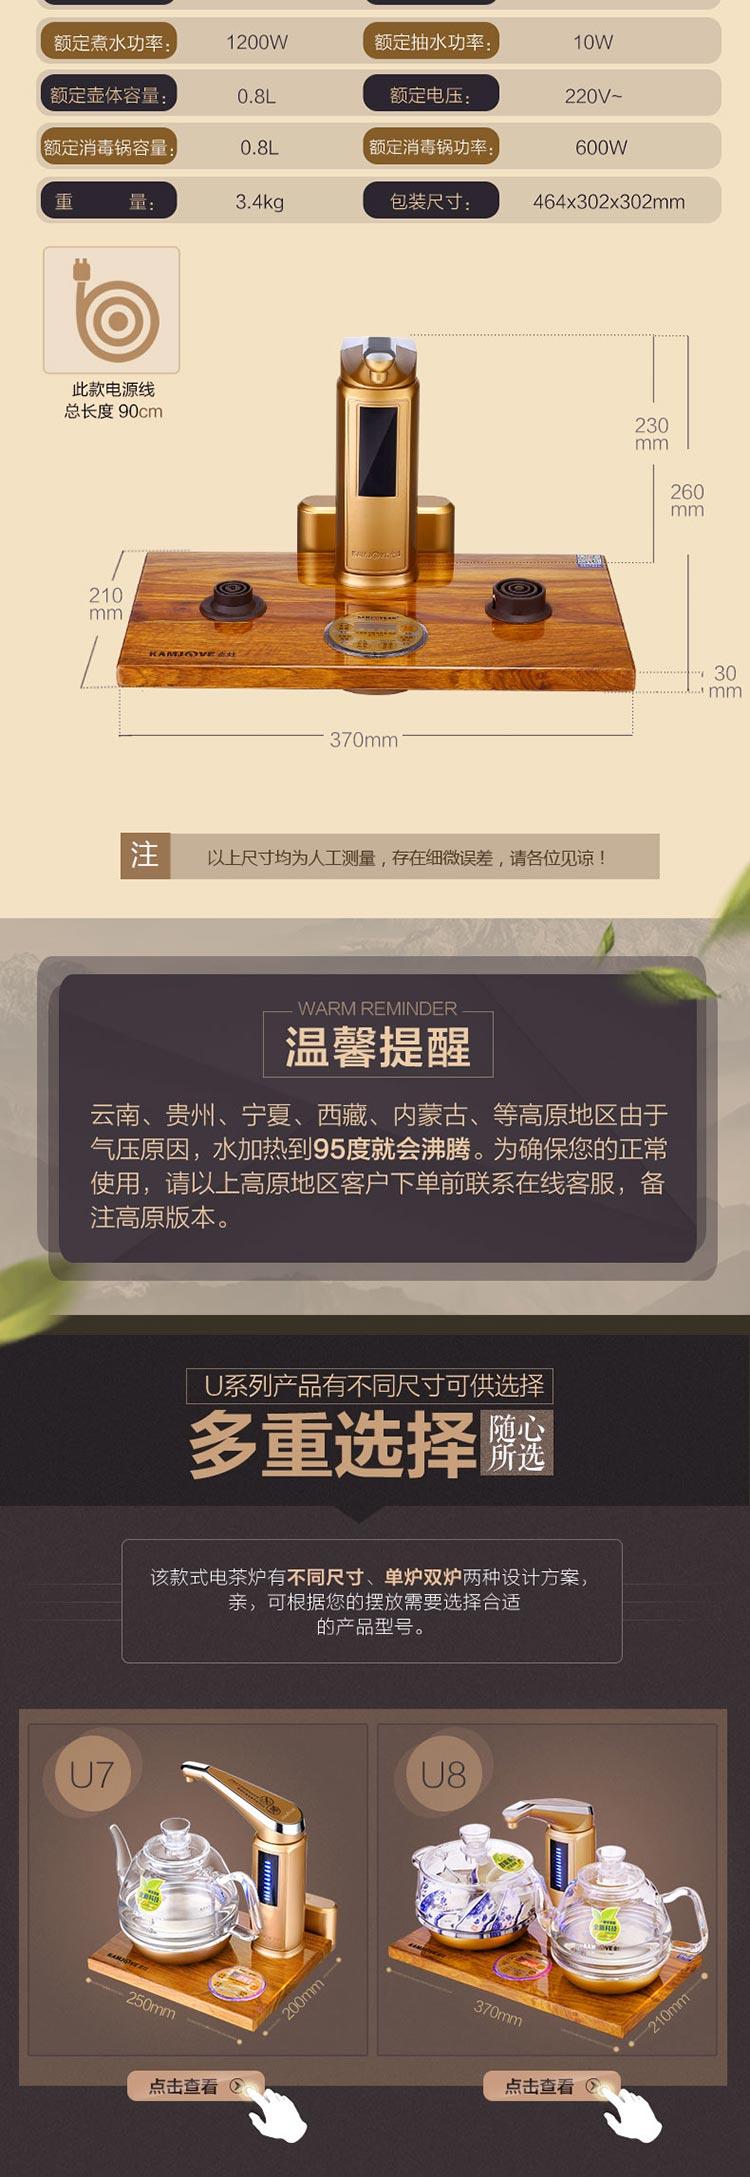 U8-详情页_10